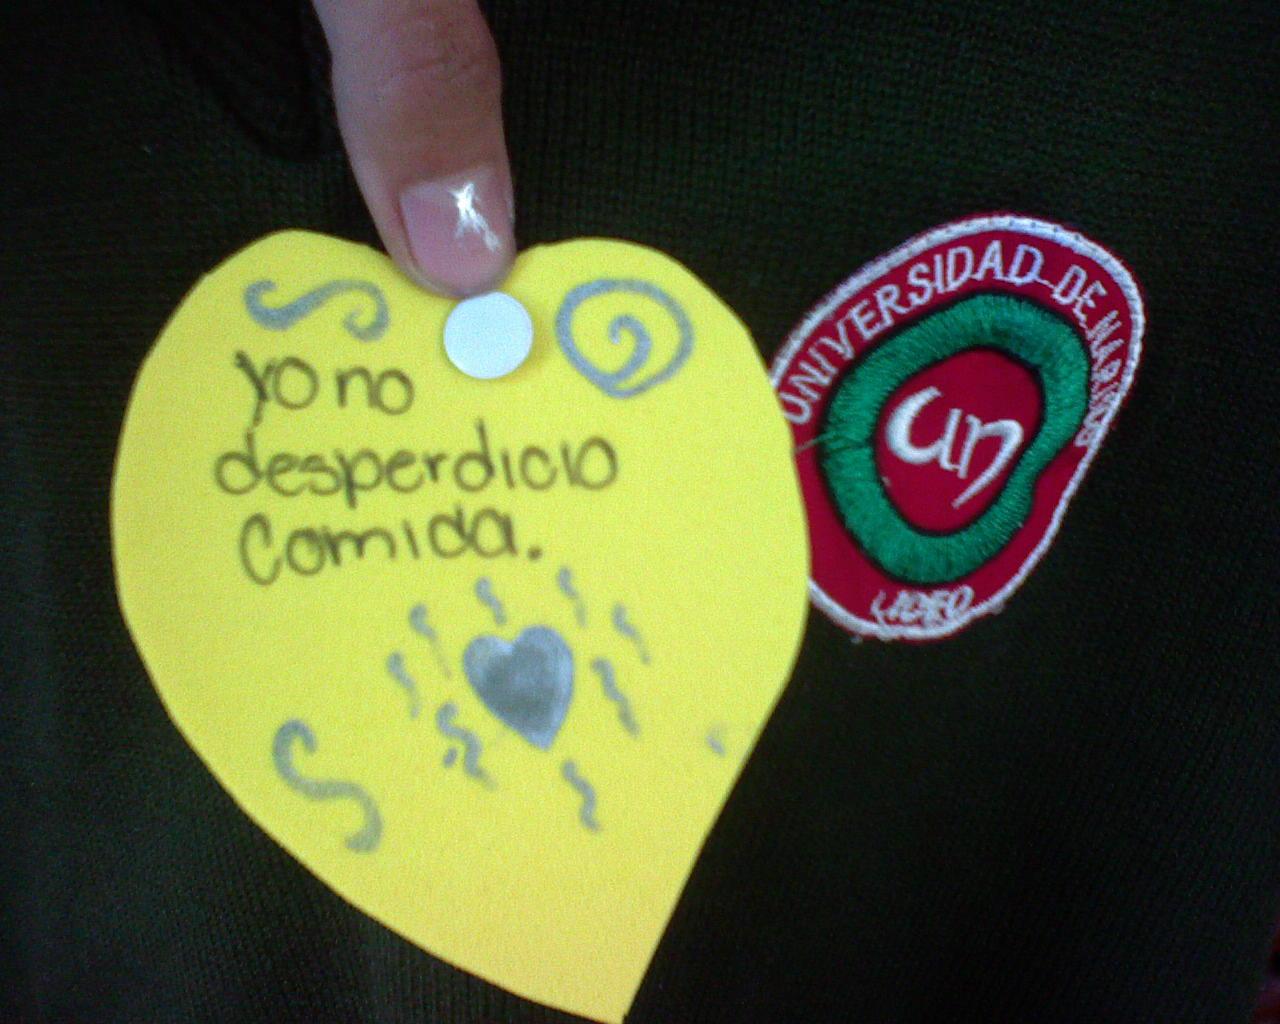 Desperdicio de comida 2012 for Proyecto restaurante escolar